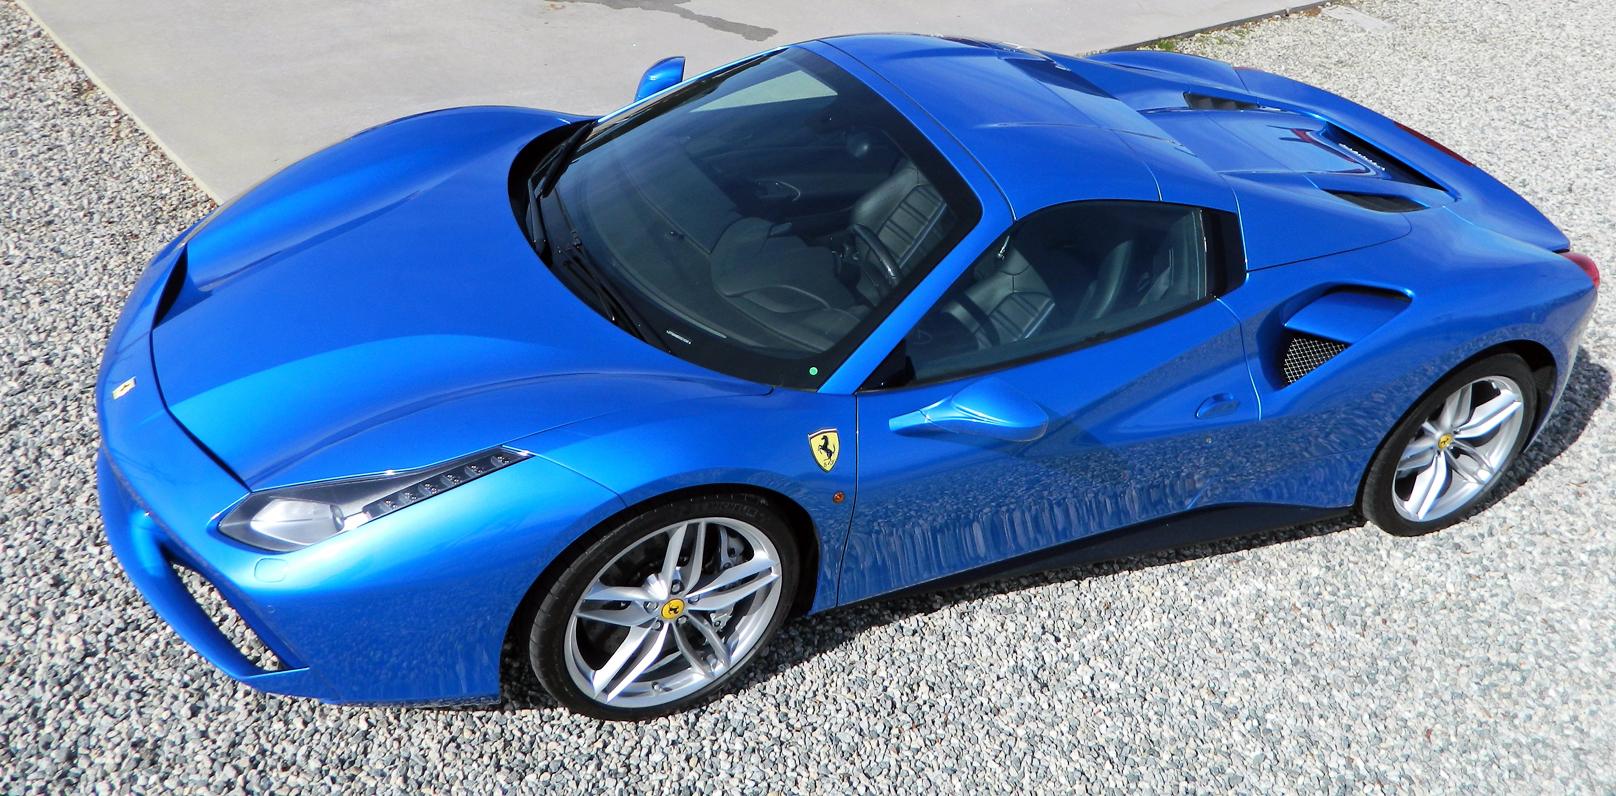 Icons Of Speed Picking Up The Blu Corsa Ferrari 488 Spider Wheels Ca